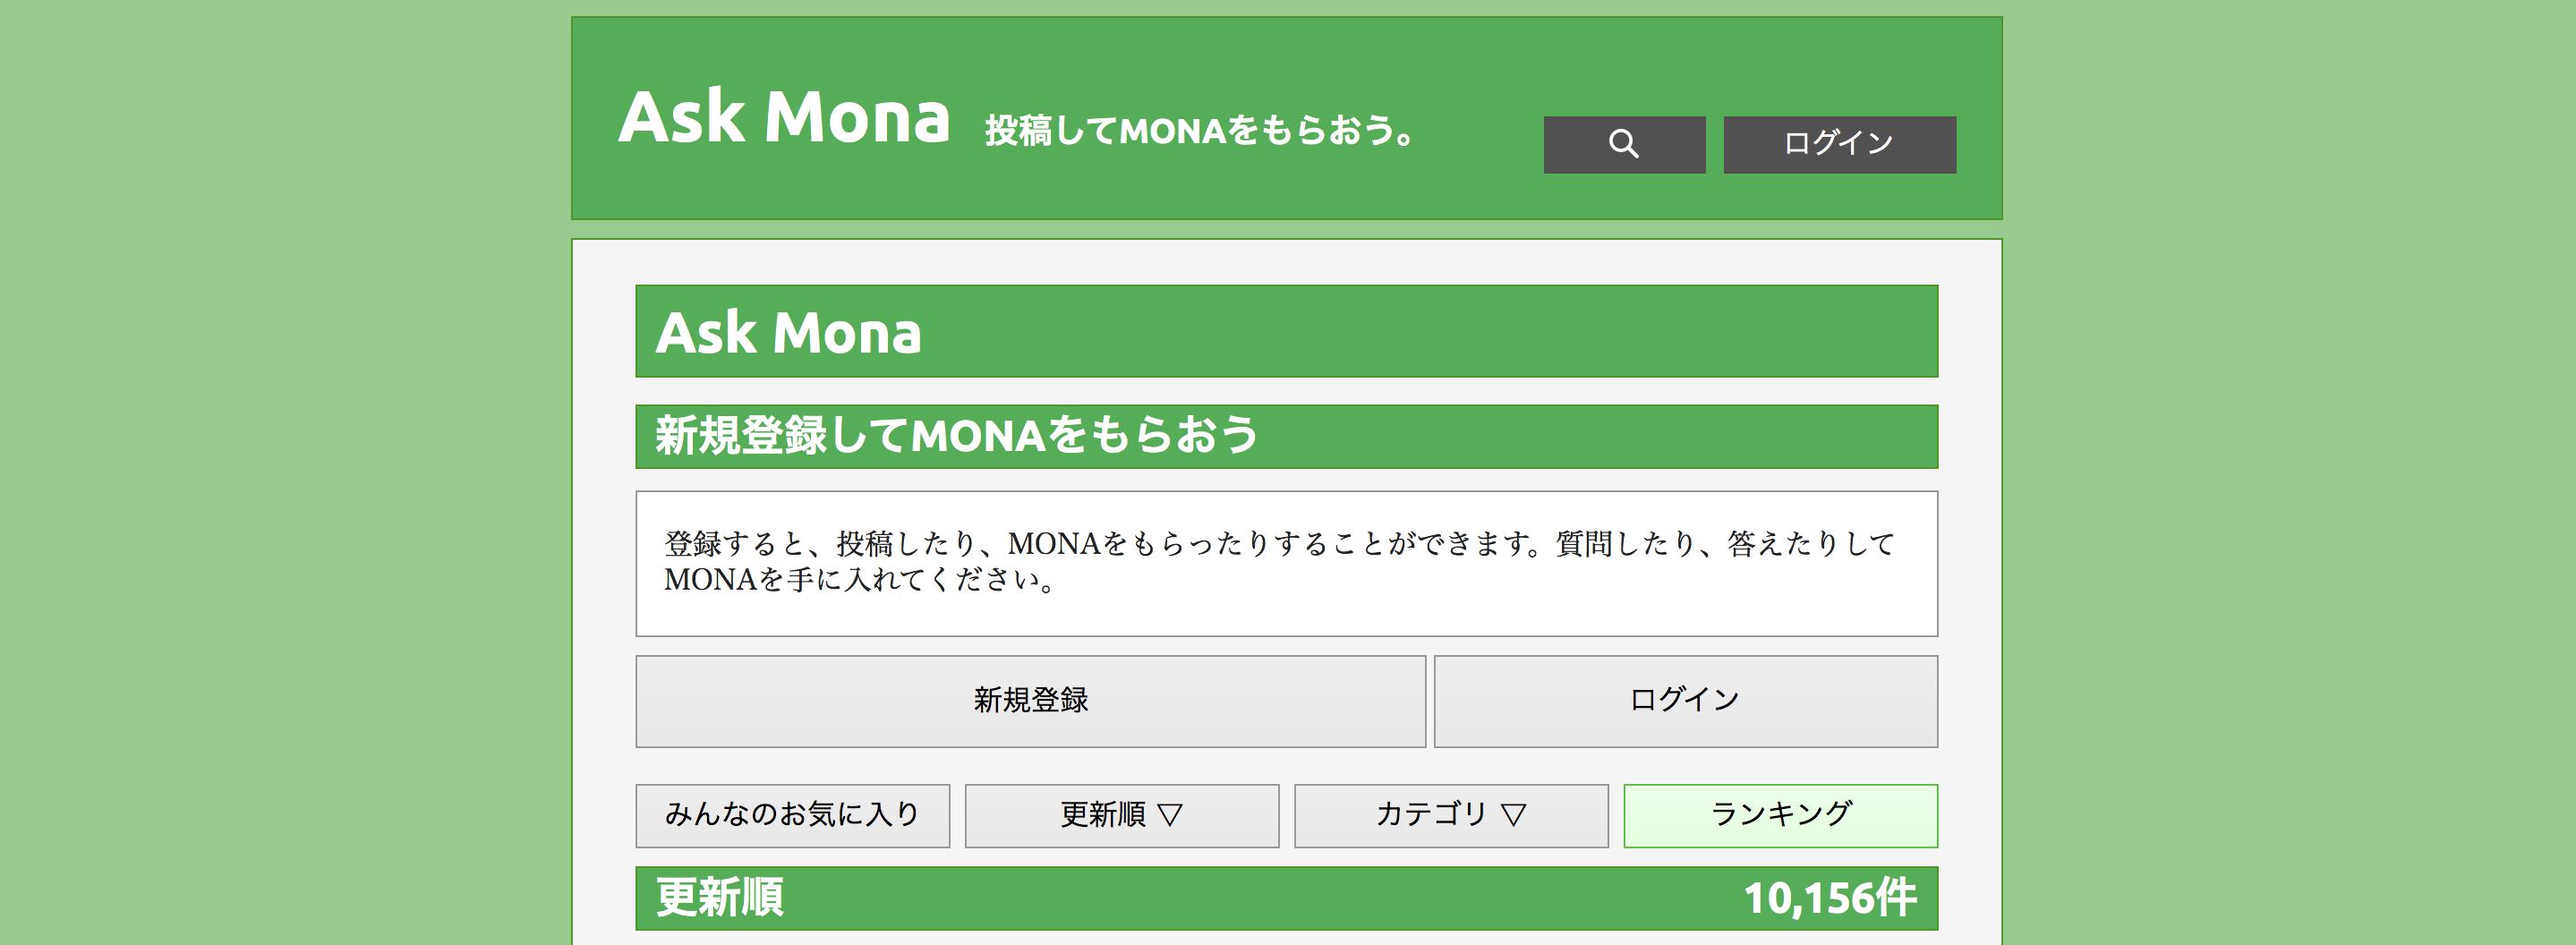 Ask Mona(アスクモナー)トップページ